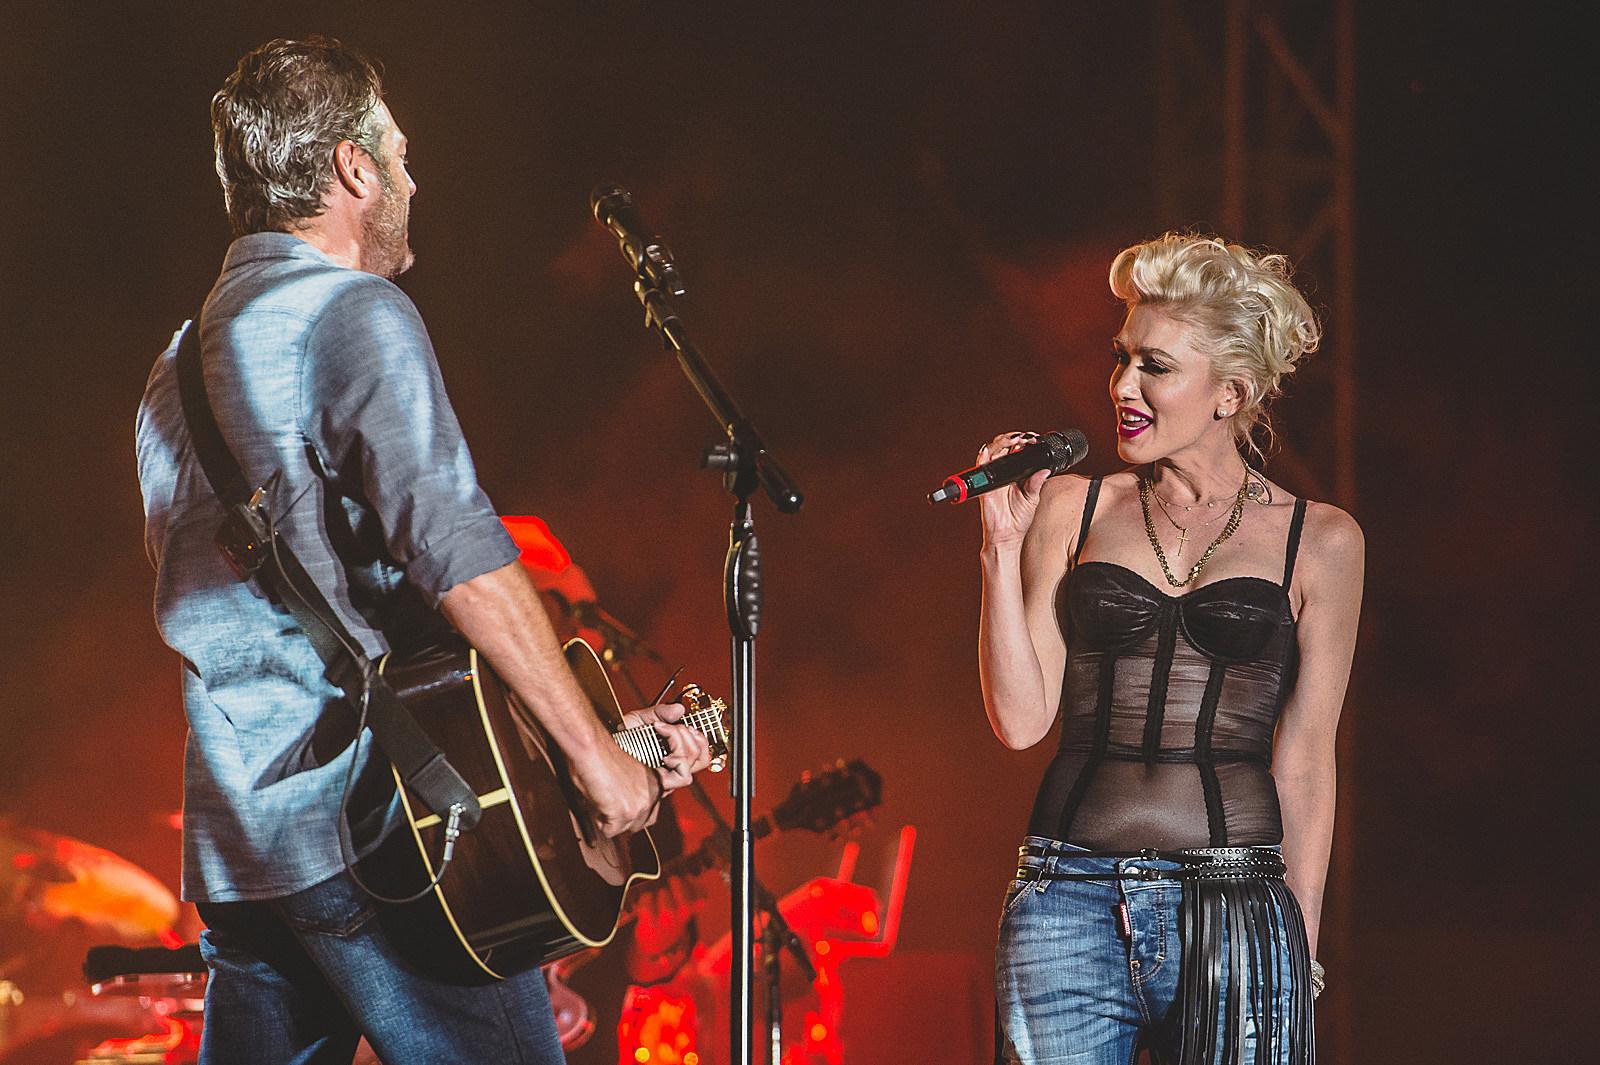 Gwen Stefani Joins Blake Shelton For Birthday Performance